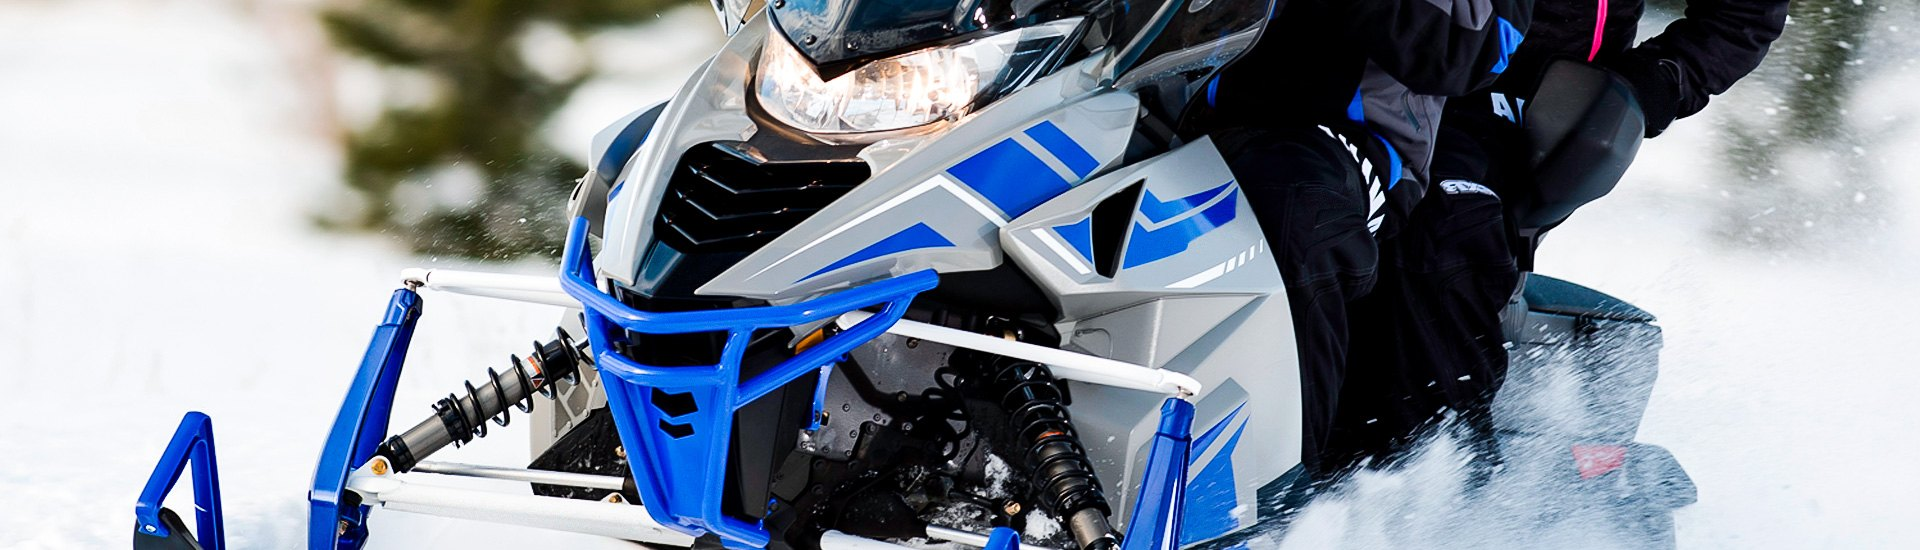 UTV Snowmobile Universal Fit Extreme Max Flexible Hand Guard Protection ATV